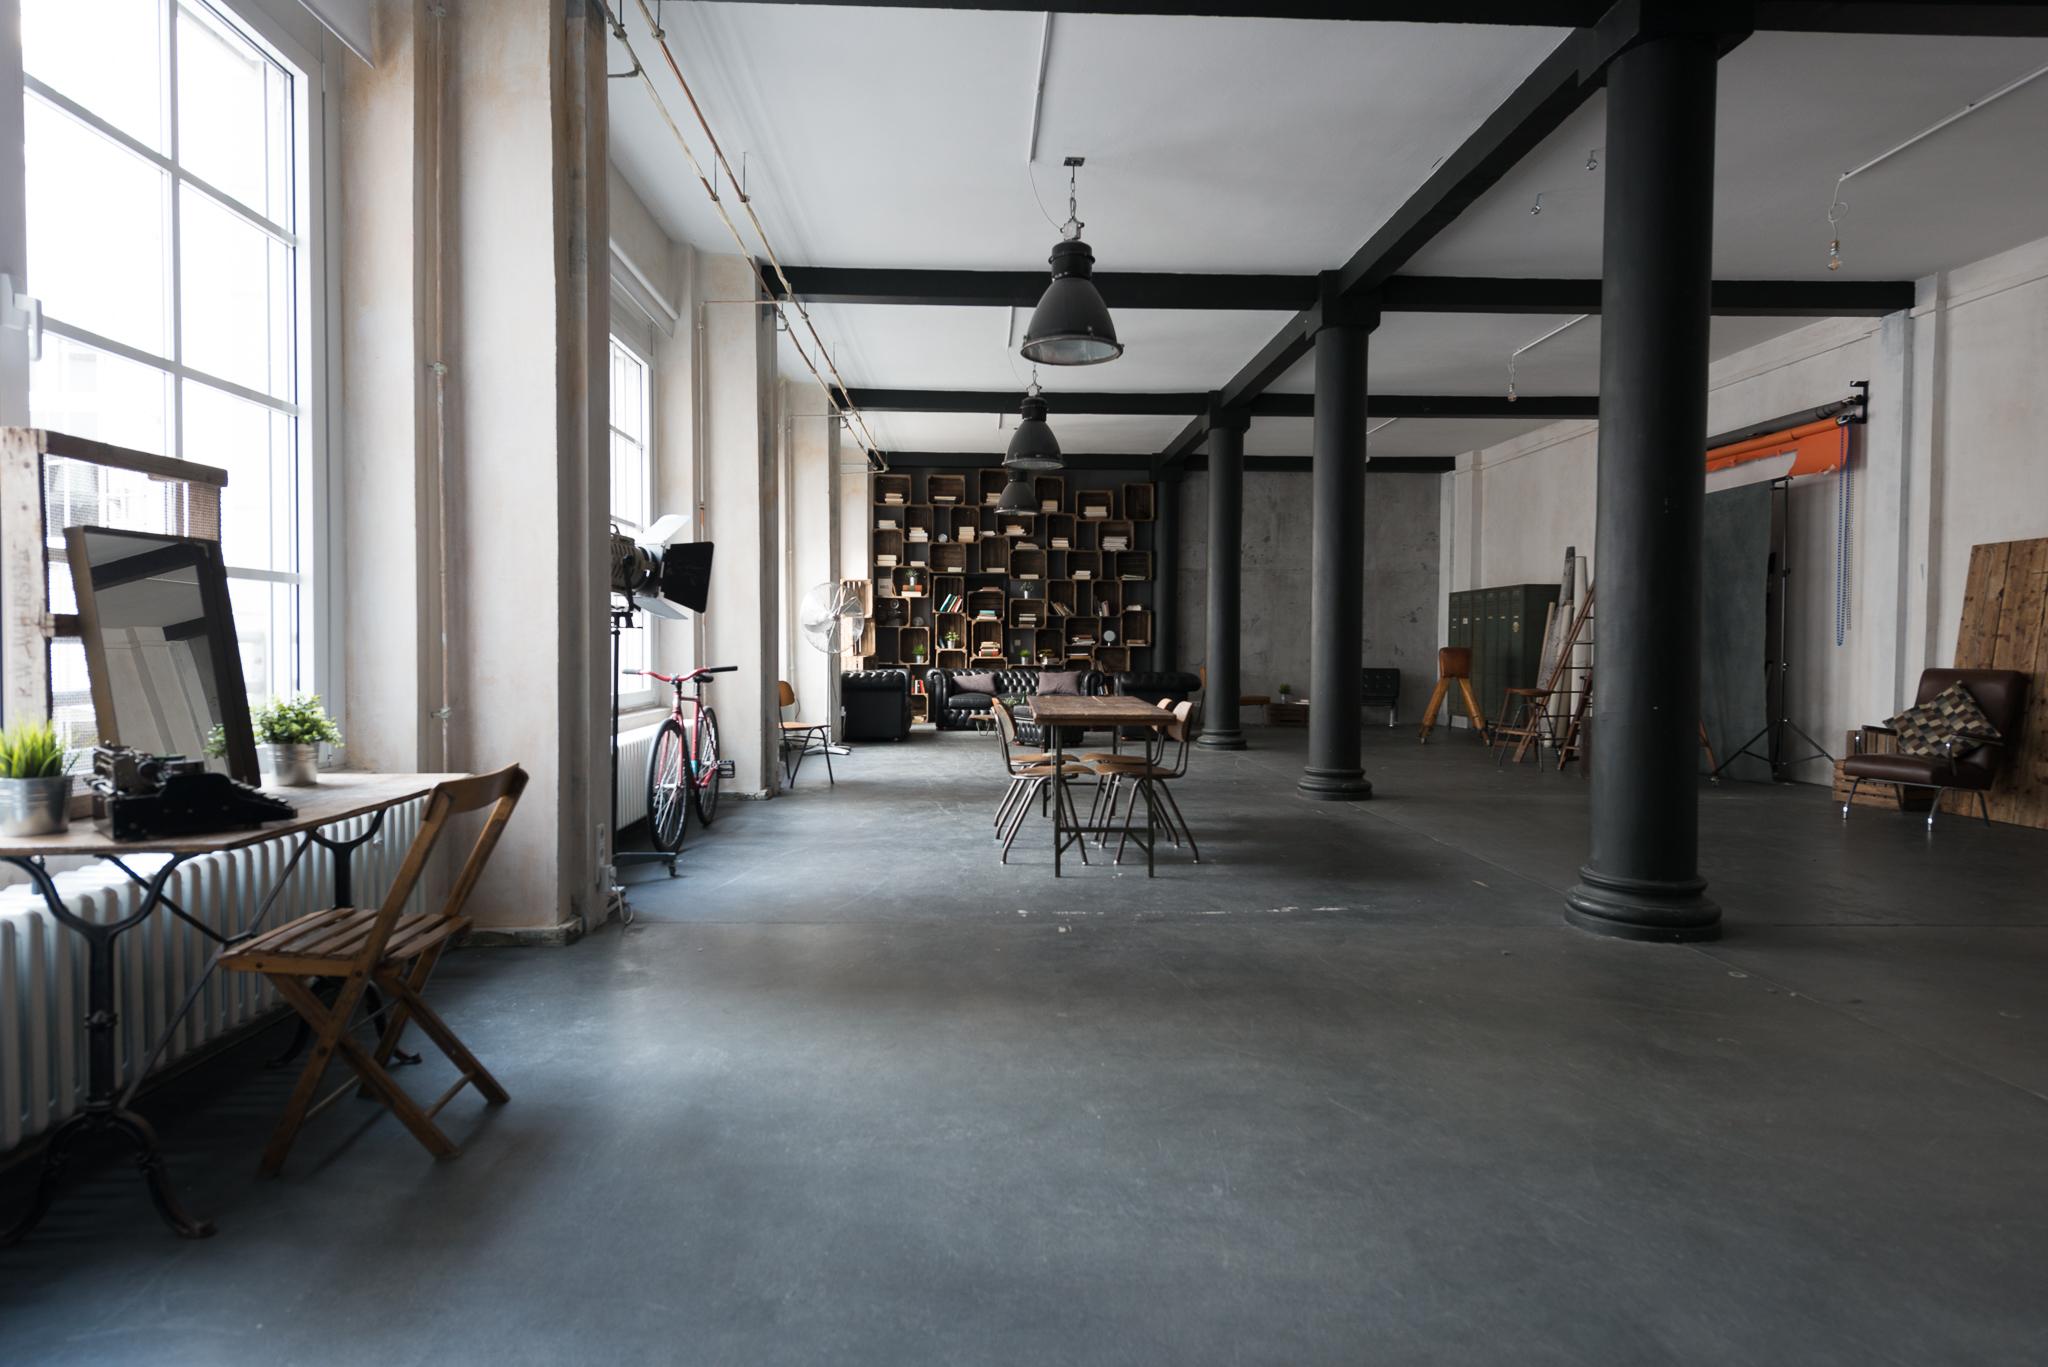 loftstudiocologne-factory-loft.jpg